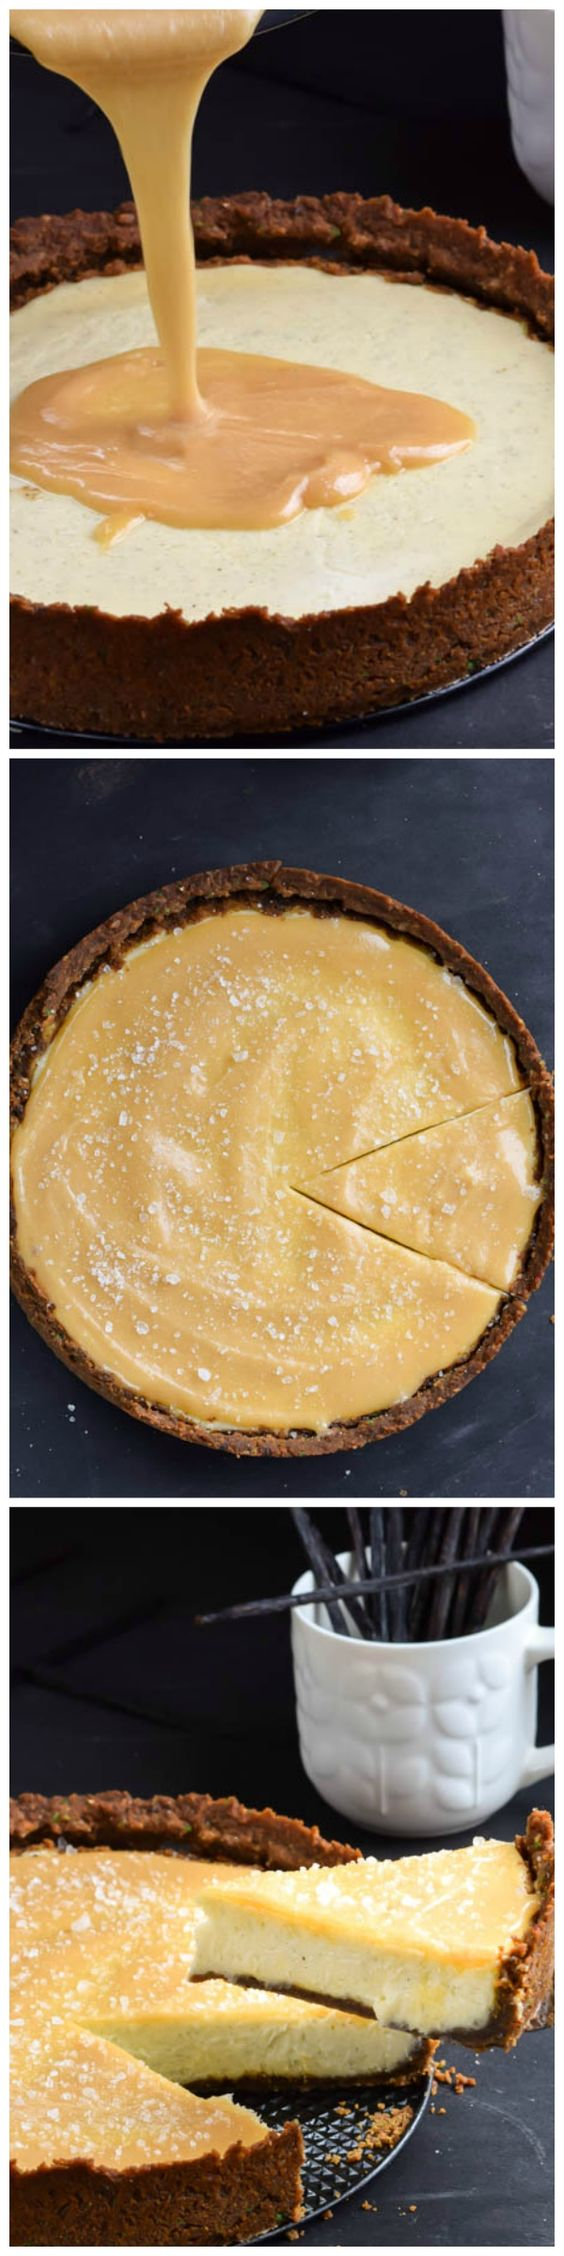 Salted Caramel Vanilla Bean Cheesecake with Crumb Crust ...